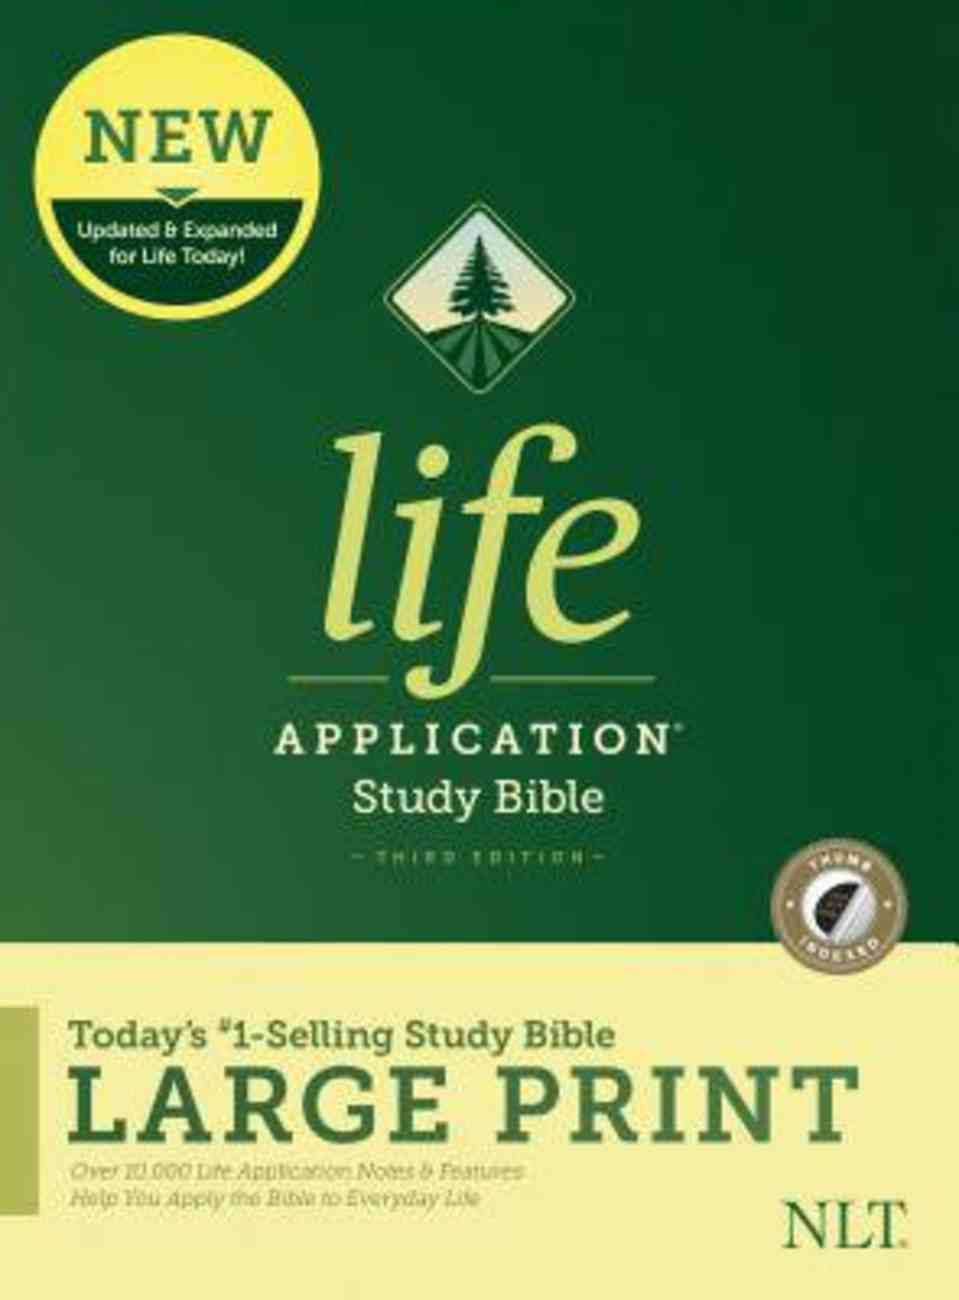 NLT Life Application Study Bible Third Edition Large Print Indexed (Black Letter Edition) Hardback